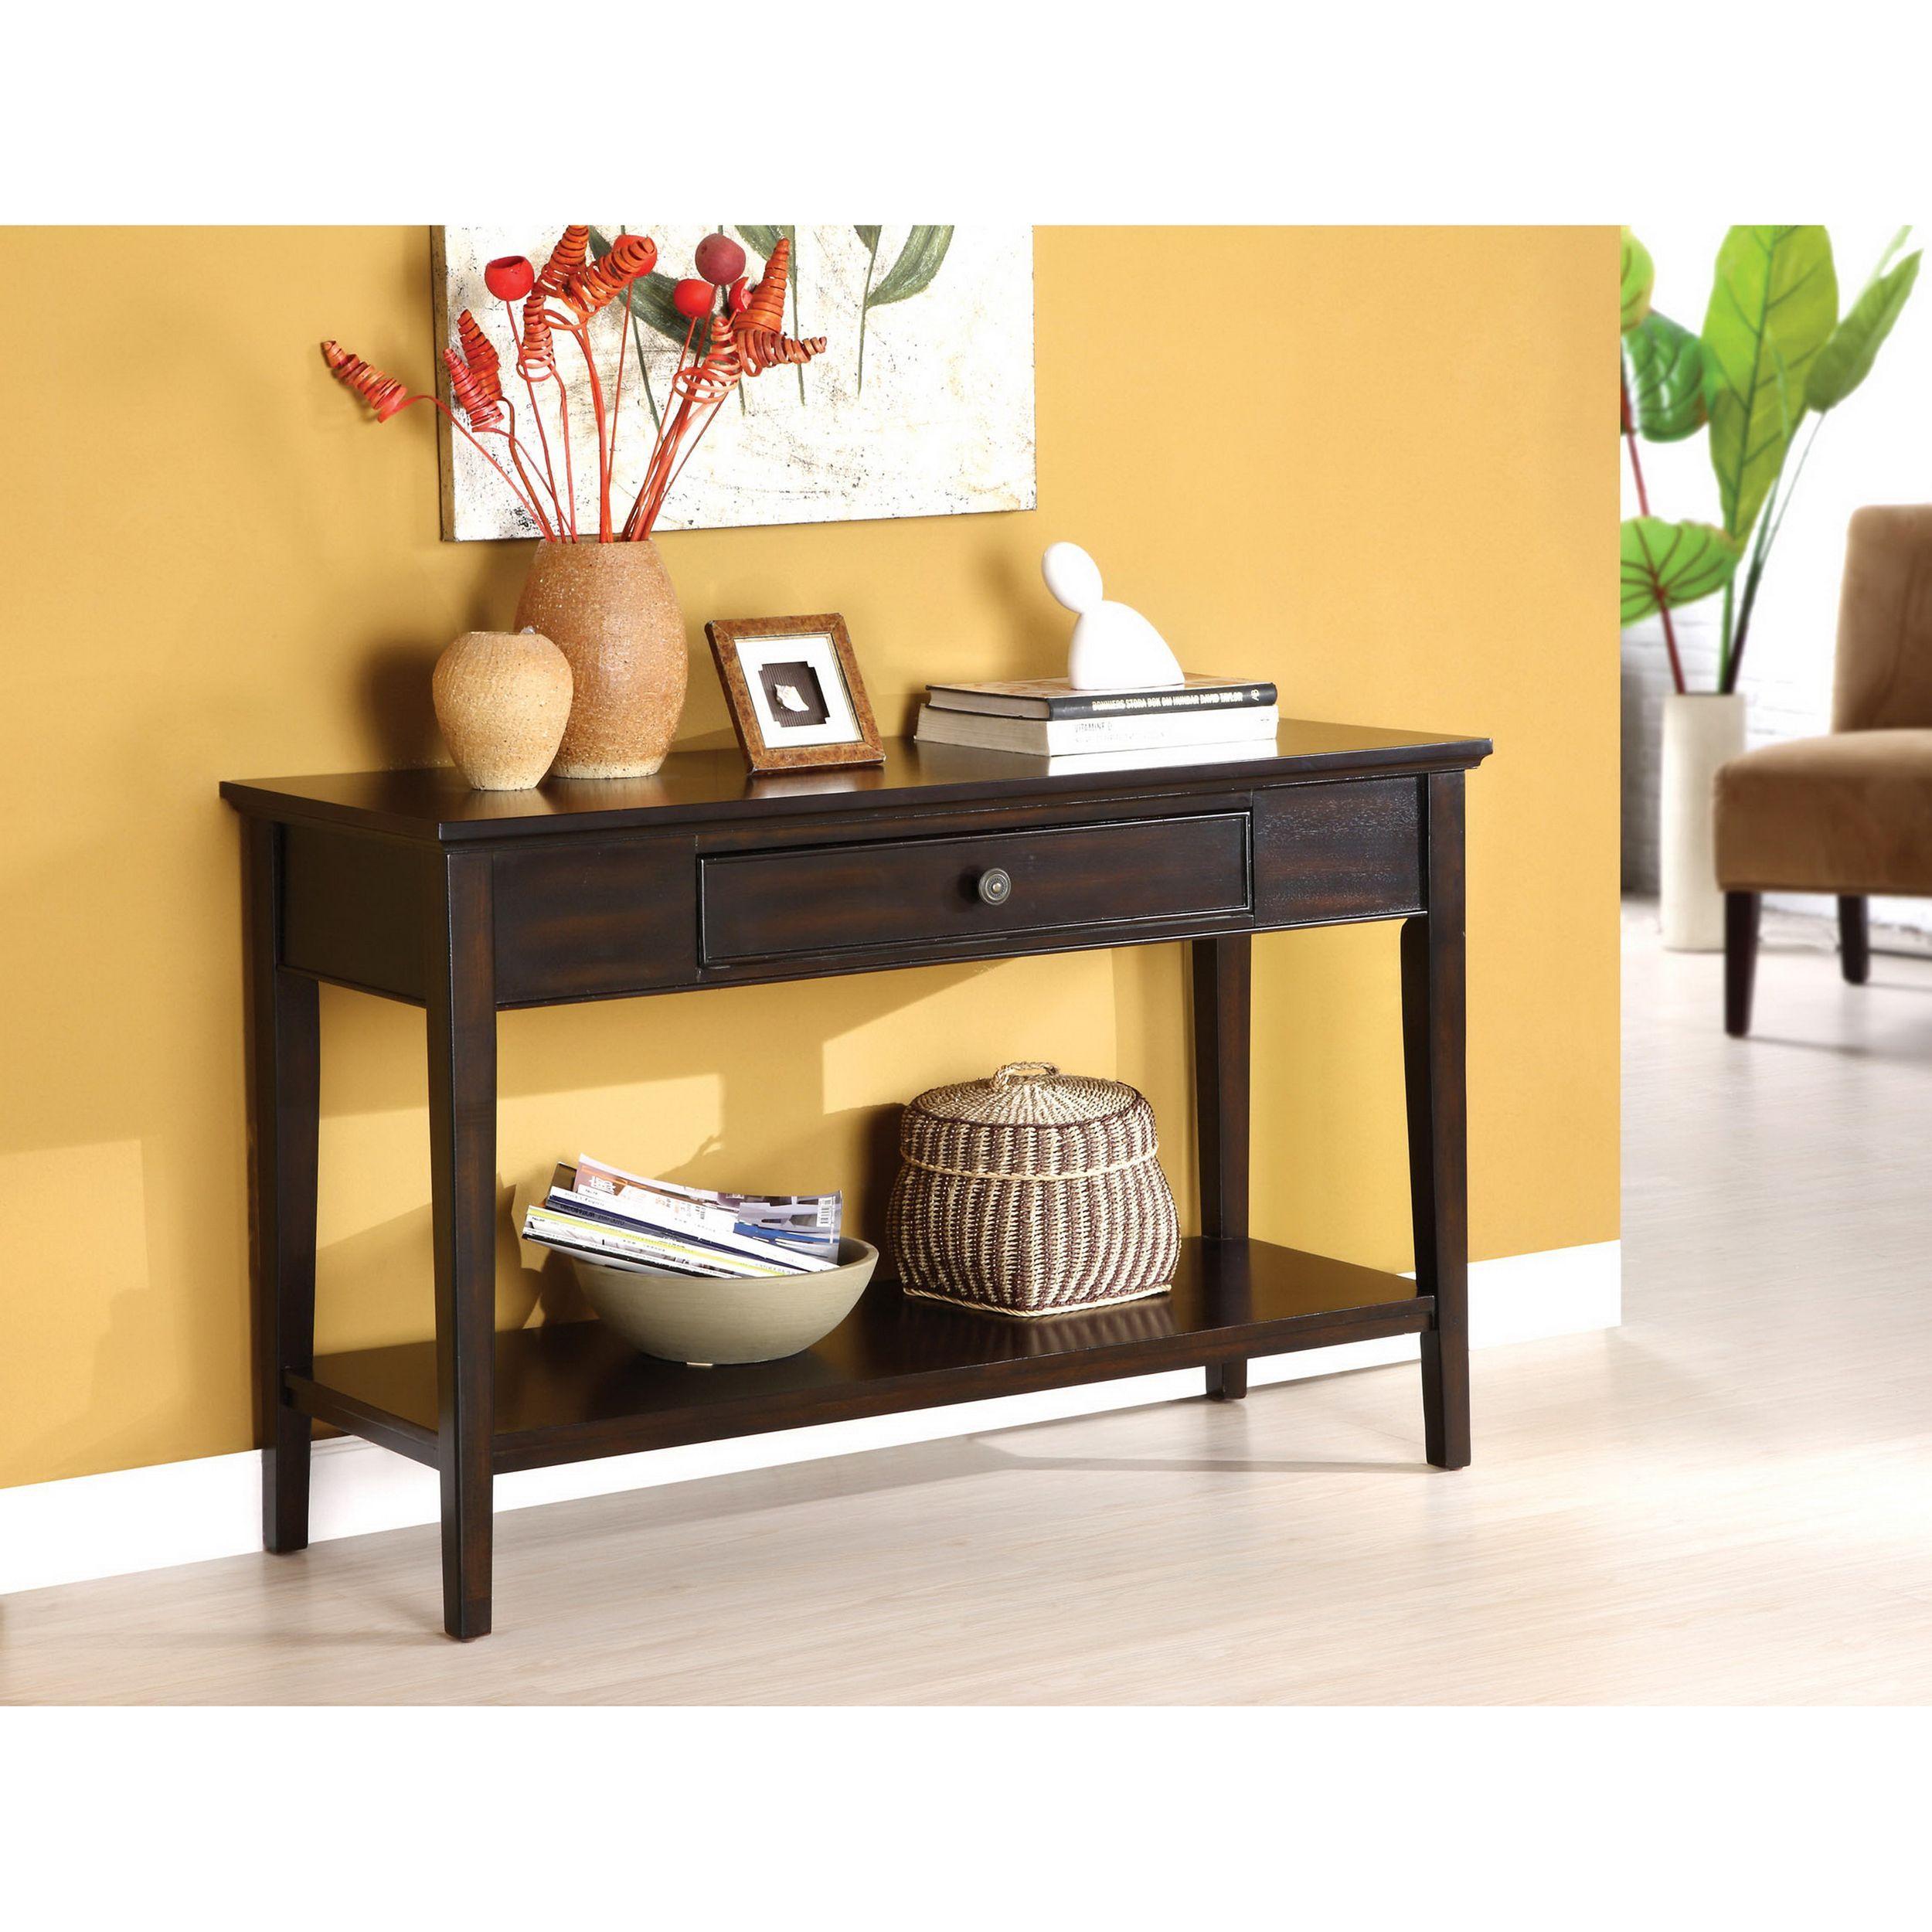 Phenomenal Furniture Of America Karlyn Dark Cherry Sofa Entryway Table Ibusinesslaw Wood Chair Design Ideas Ibusinesslaworg